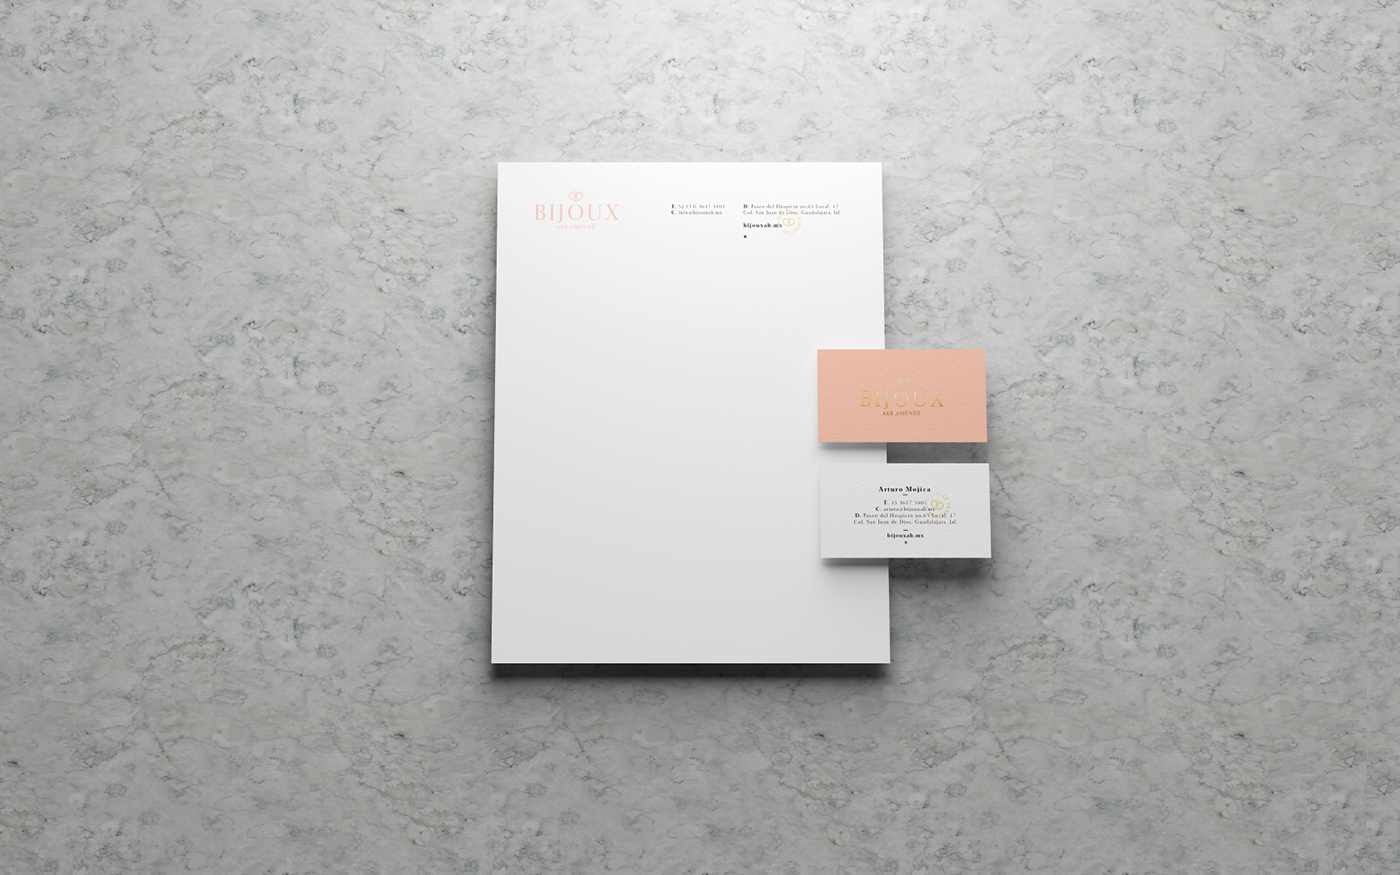 Bijoux珠寶品牌視覺形象設計欣賞-深圳VI設計4